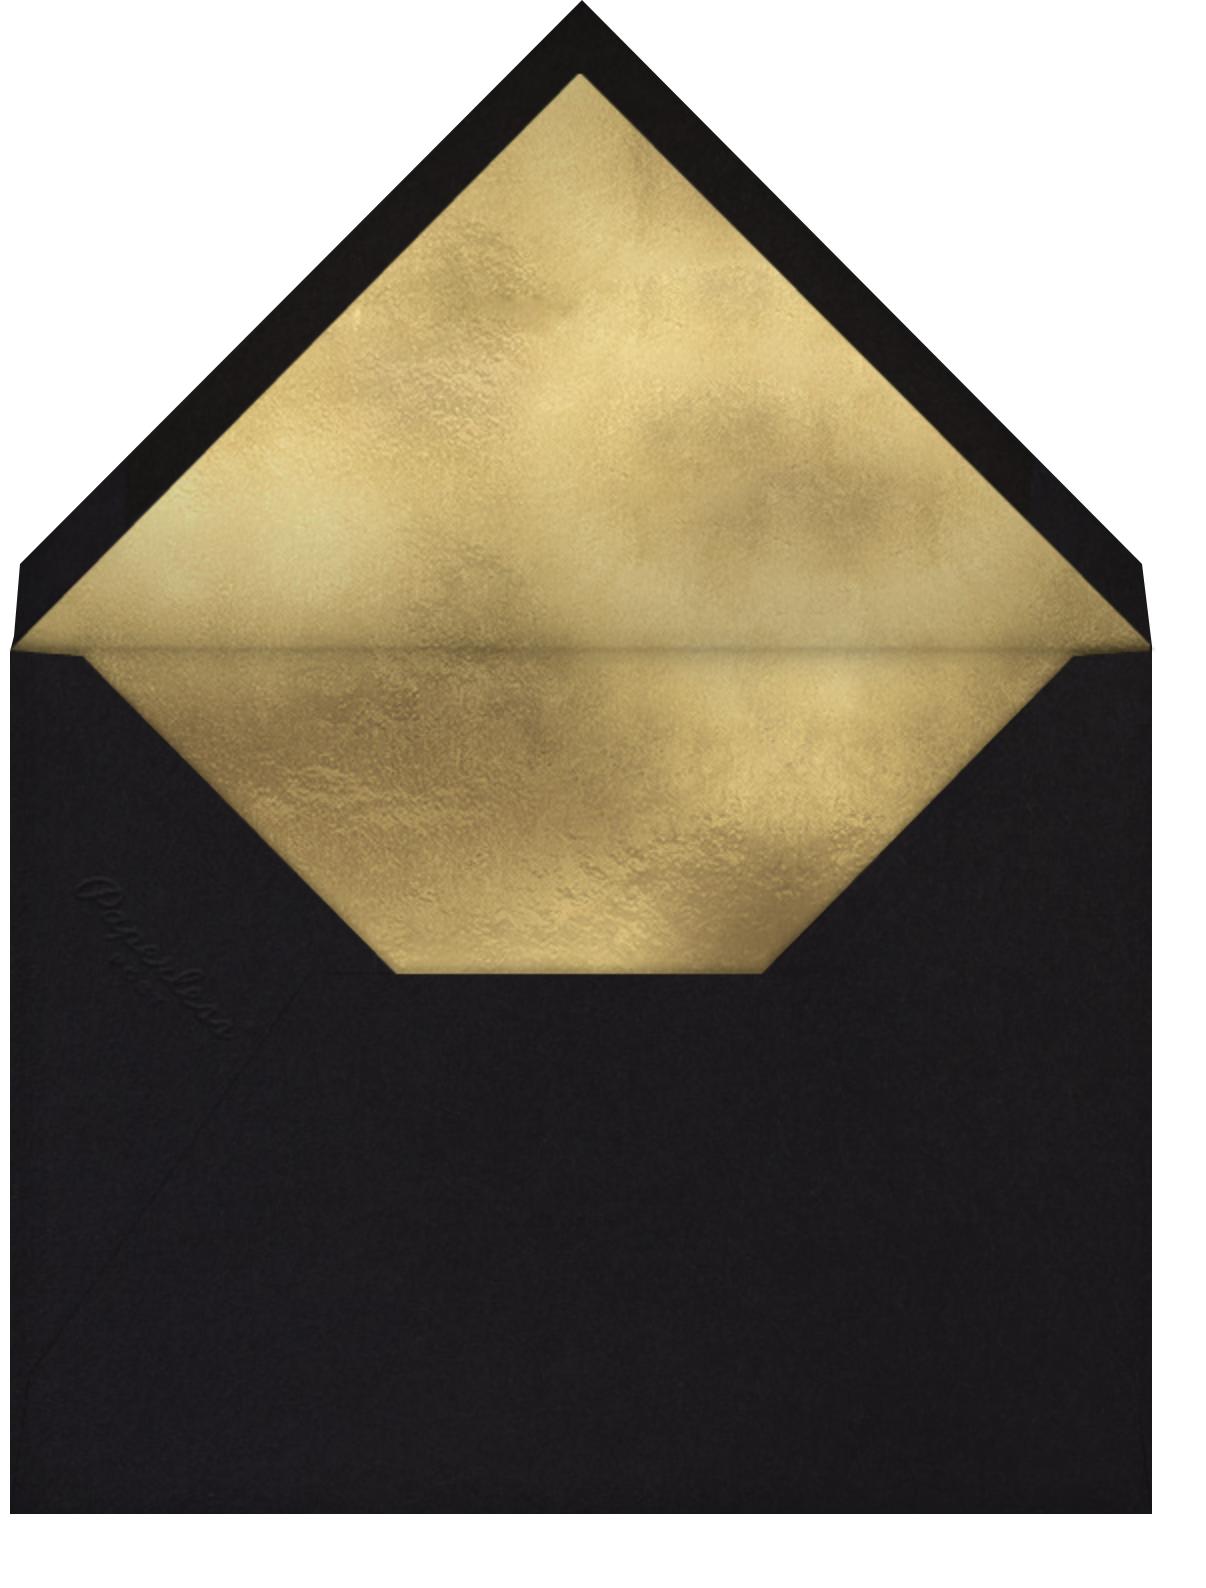 Kissapöllö - Black - Marimekko - General entertaining - envelope back